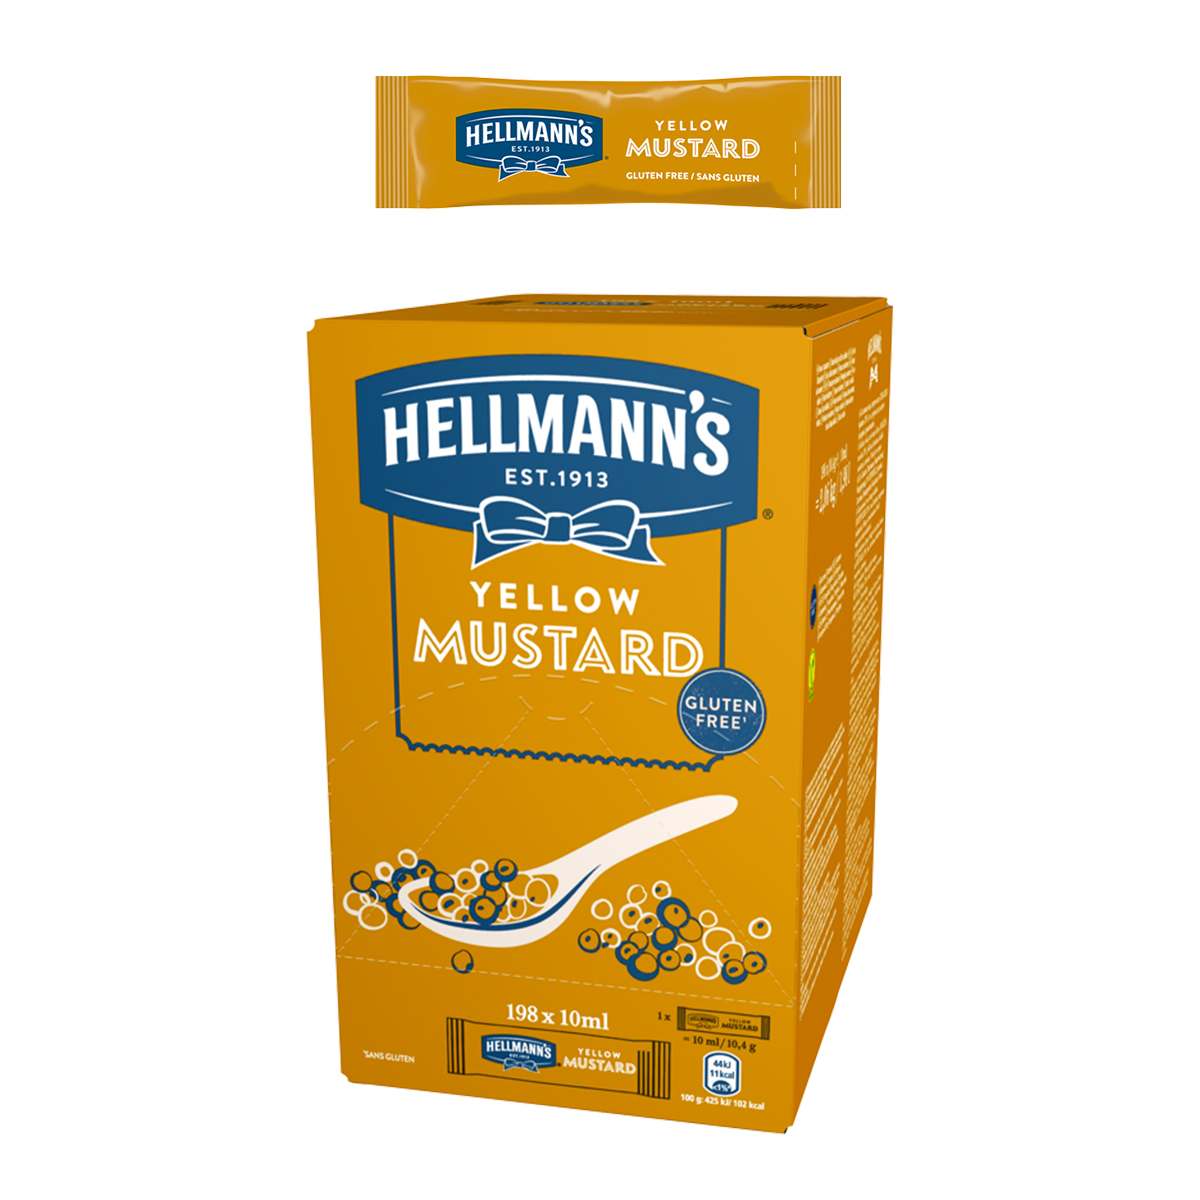 Hellmann's Горчица доза 10 ml